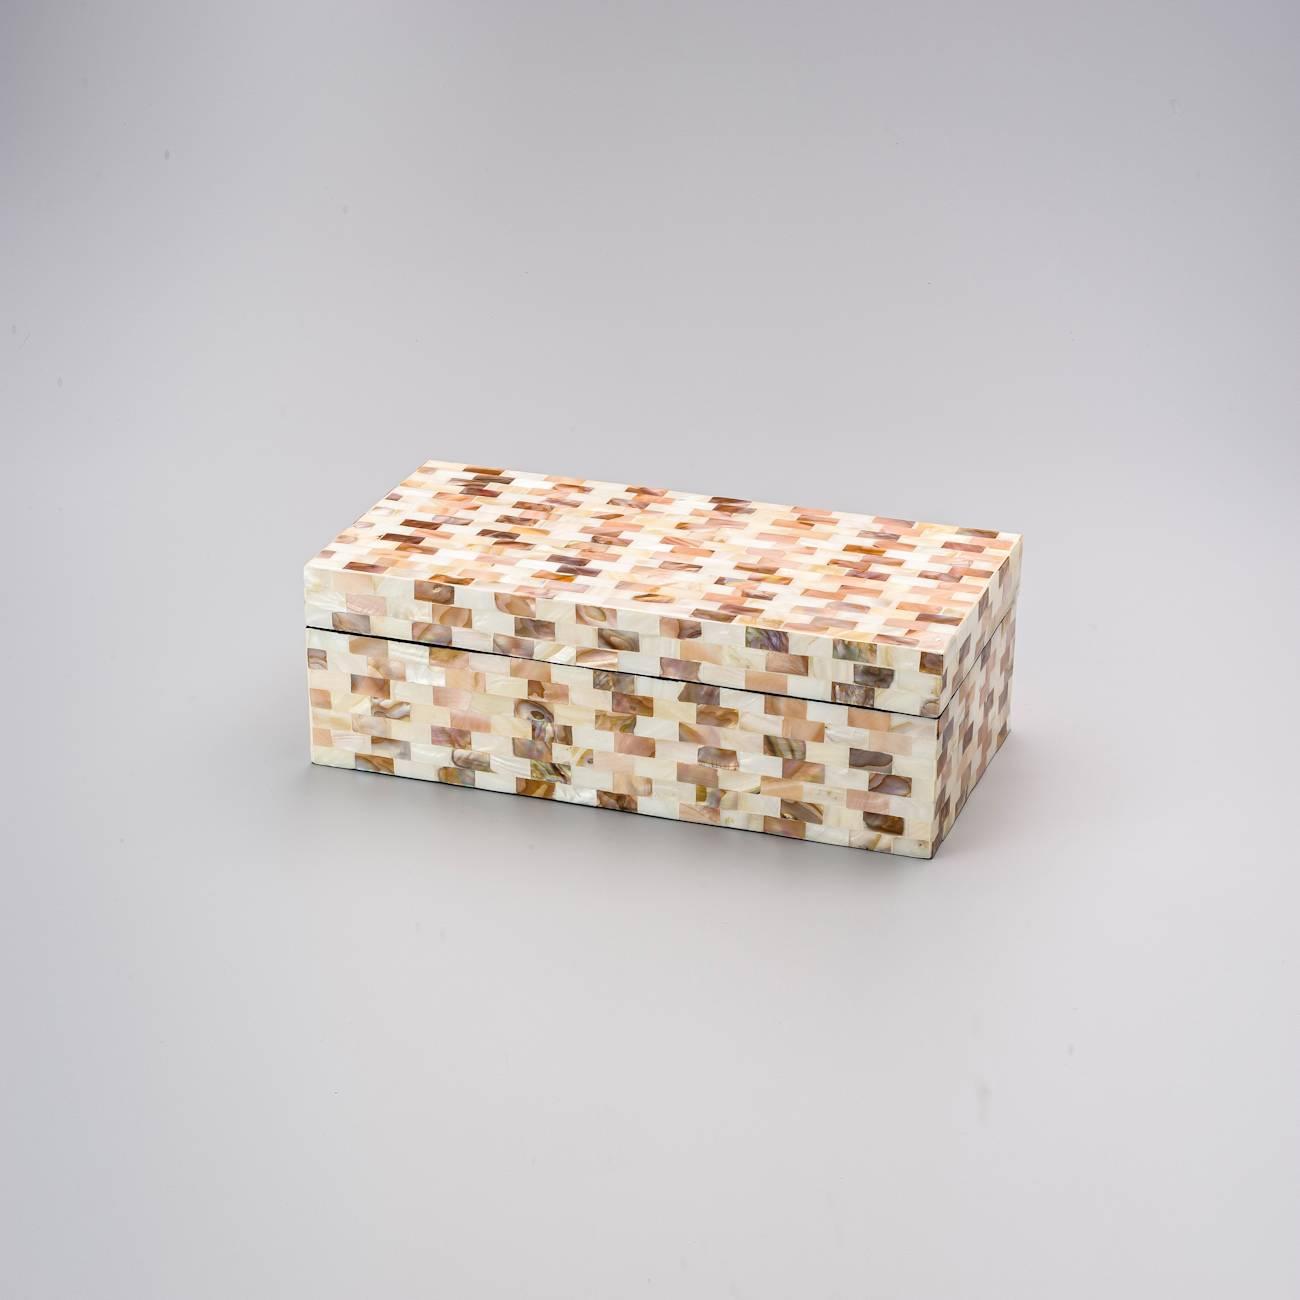 Caixa Delta Retangular Bege Grande em Madrepérola - Prestige - 35x20 cm